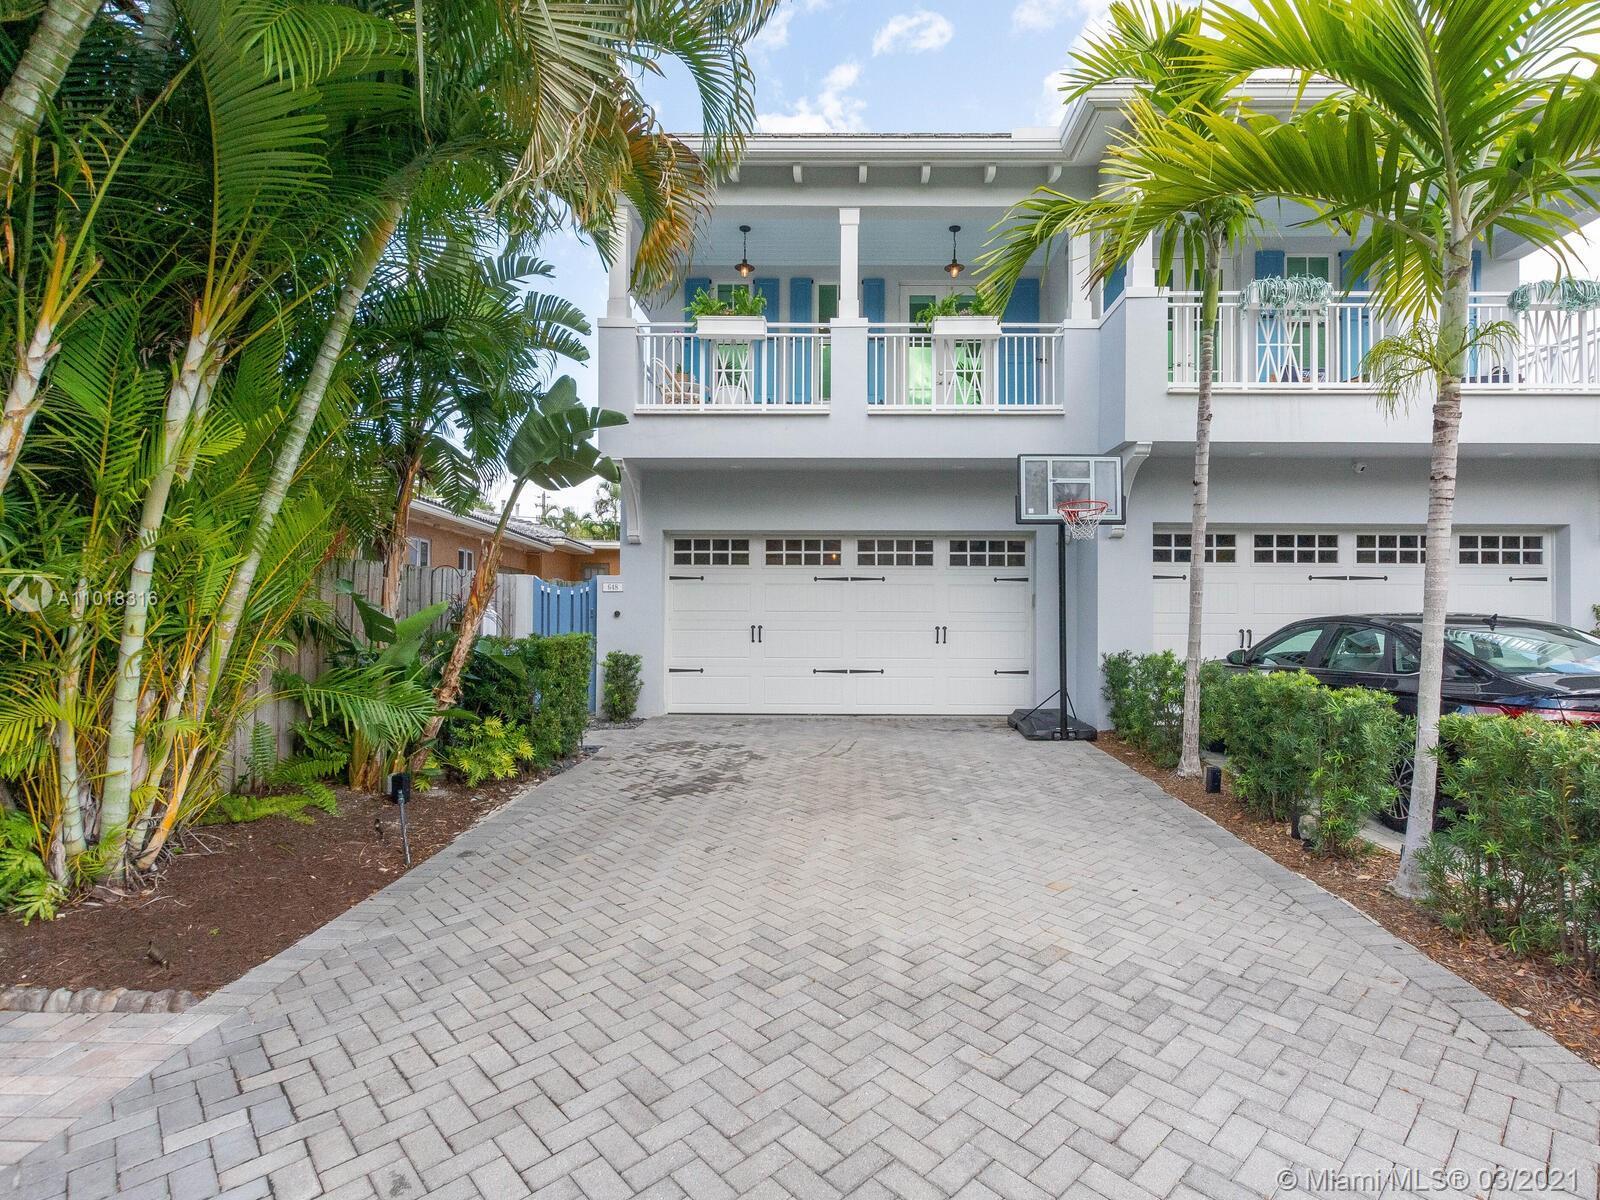 Victoria Park #648 - 648 NE 17th Way #648, Fort Lauderdale, FL 33304